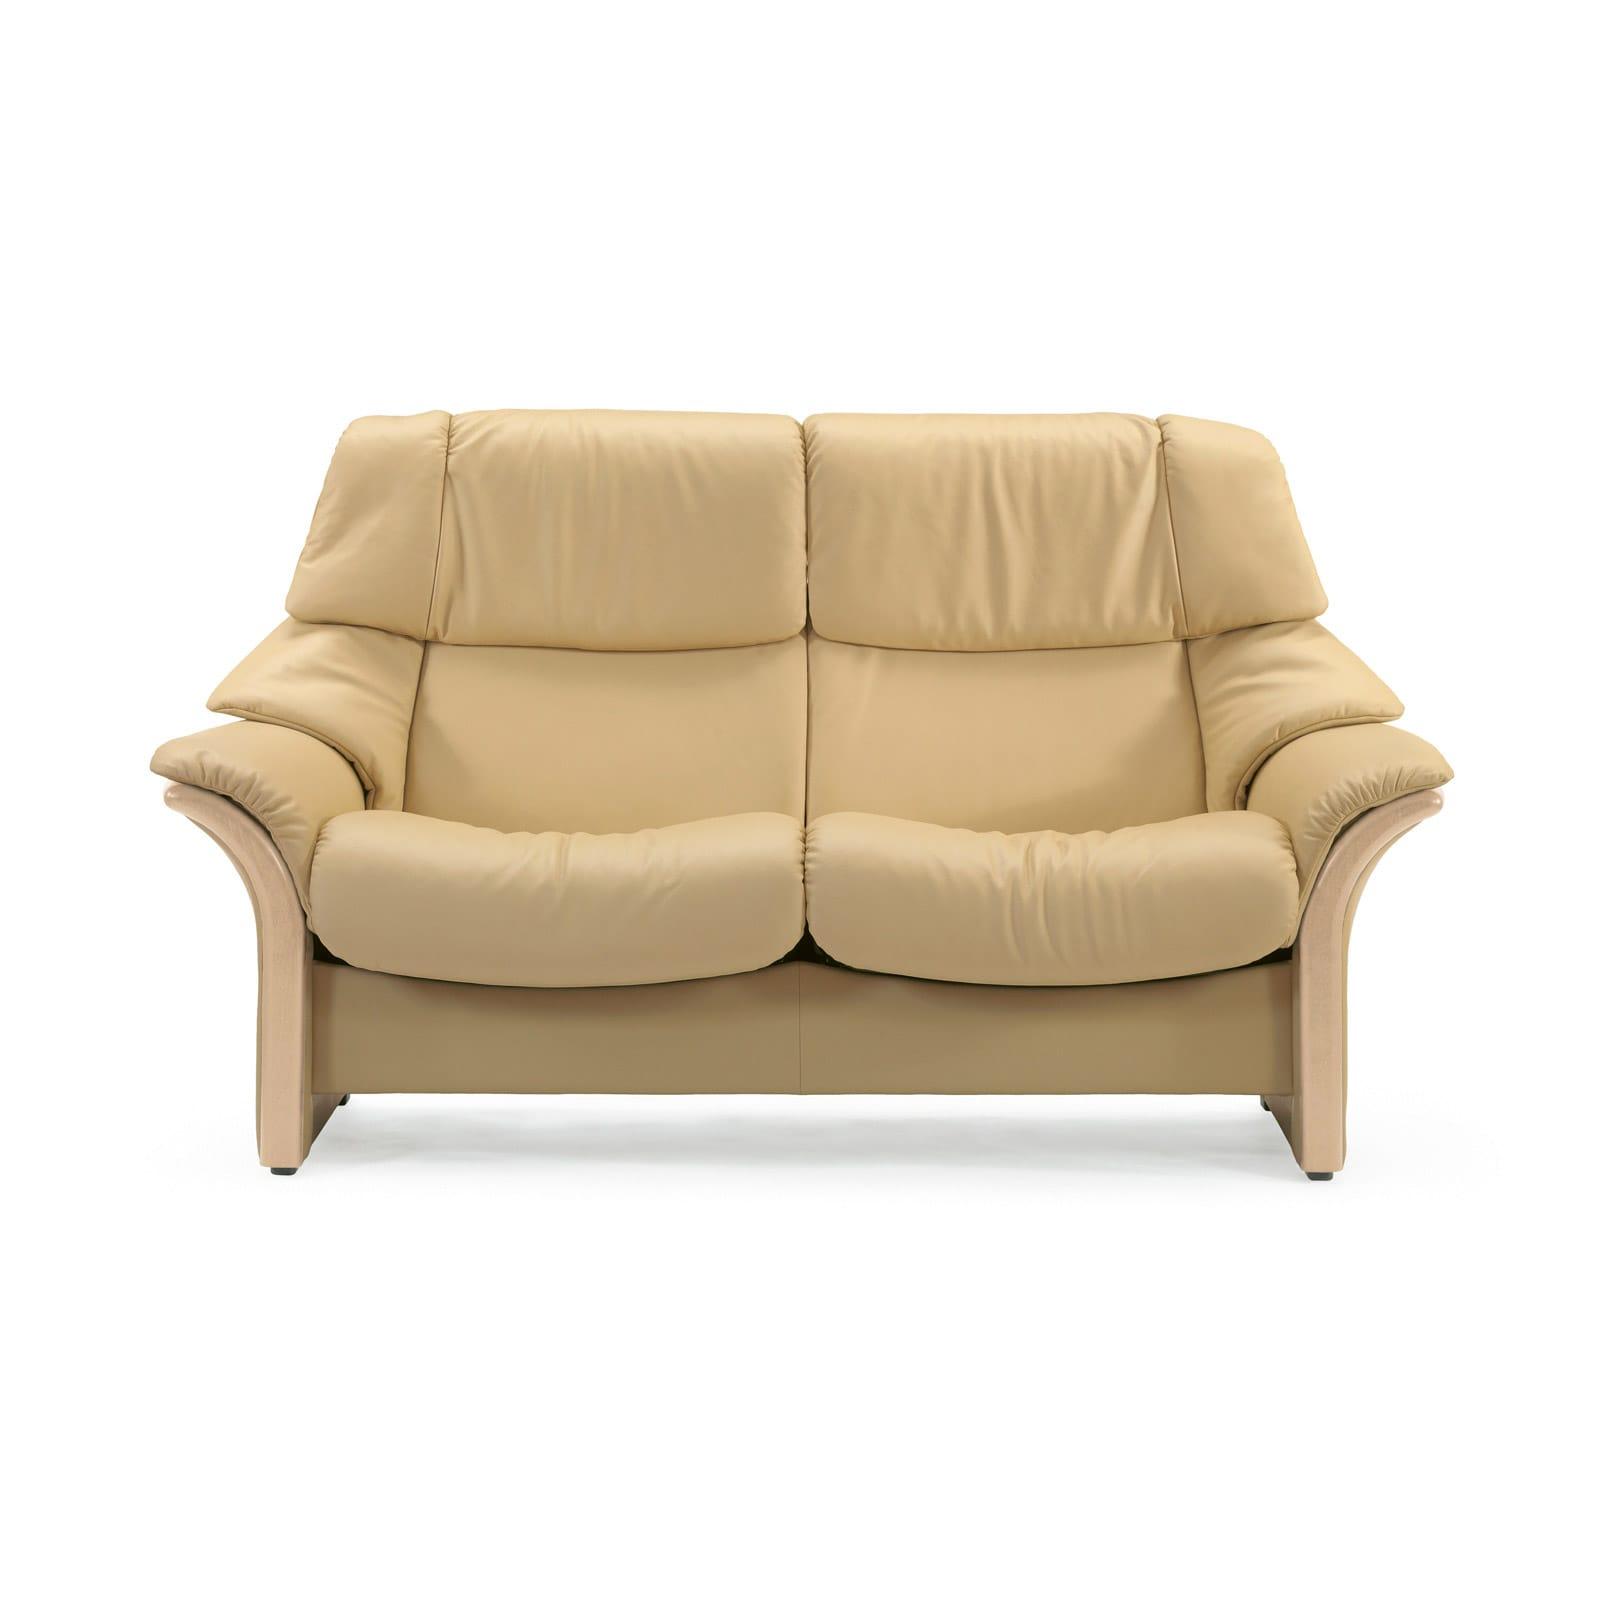 stressless sofa 2 sitzer eldorado m hoch sand natur. Black Bedroom Furniture Sets. Home Design Ideas